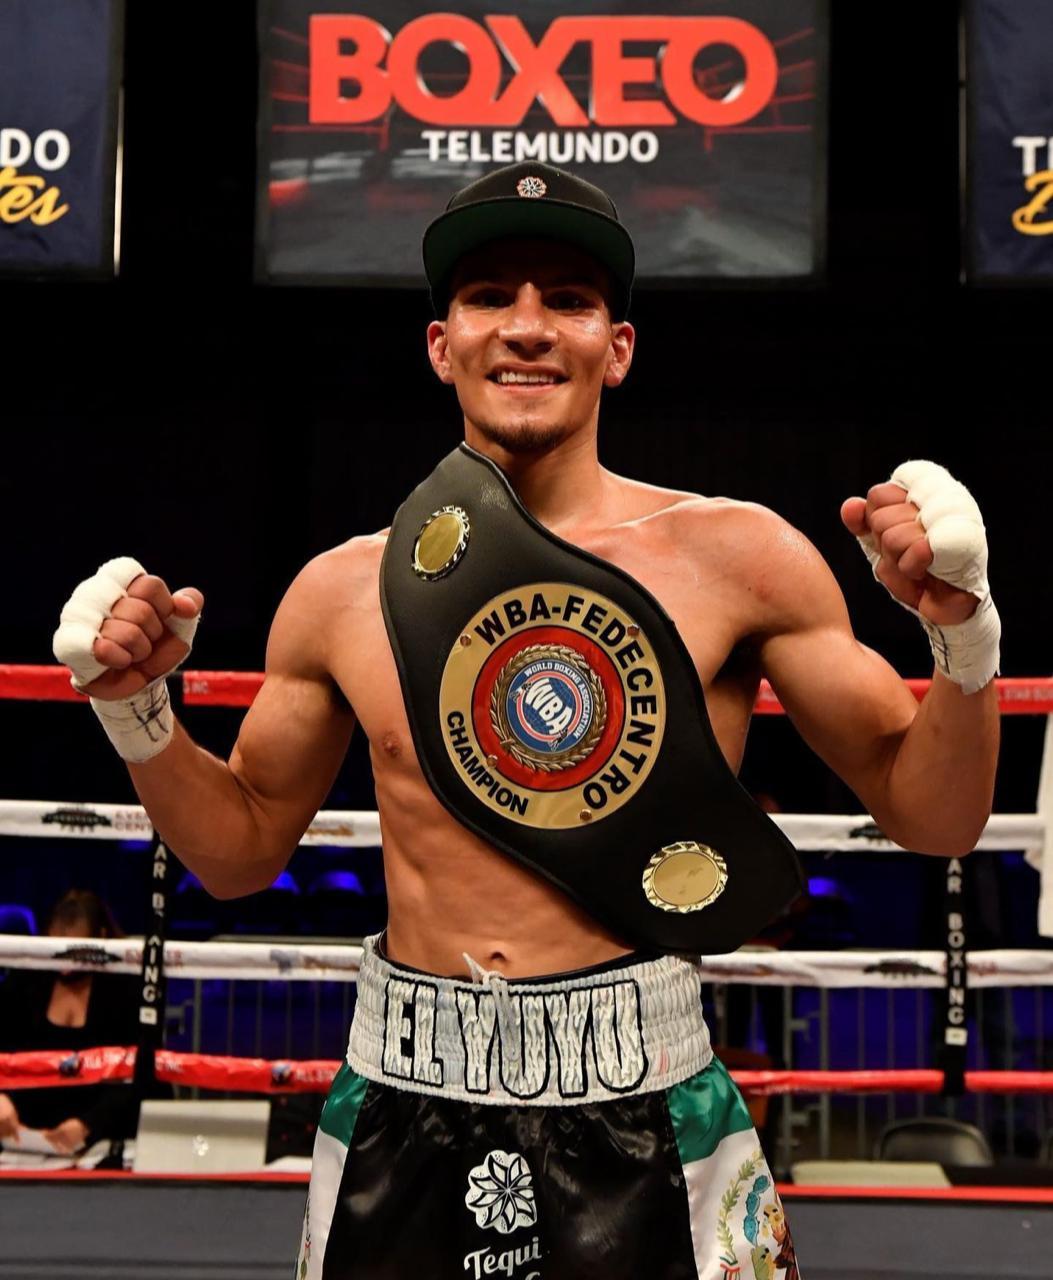 Acosta won the WBA-Fedecentro belt in Kissimmee